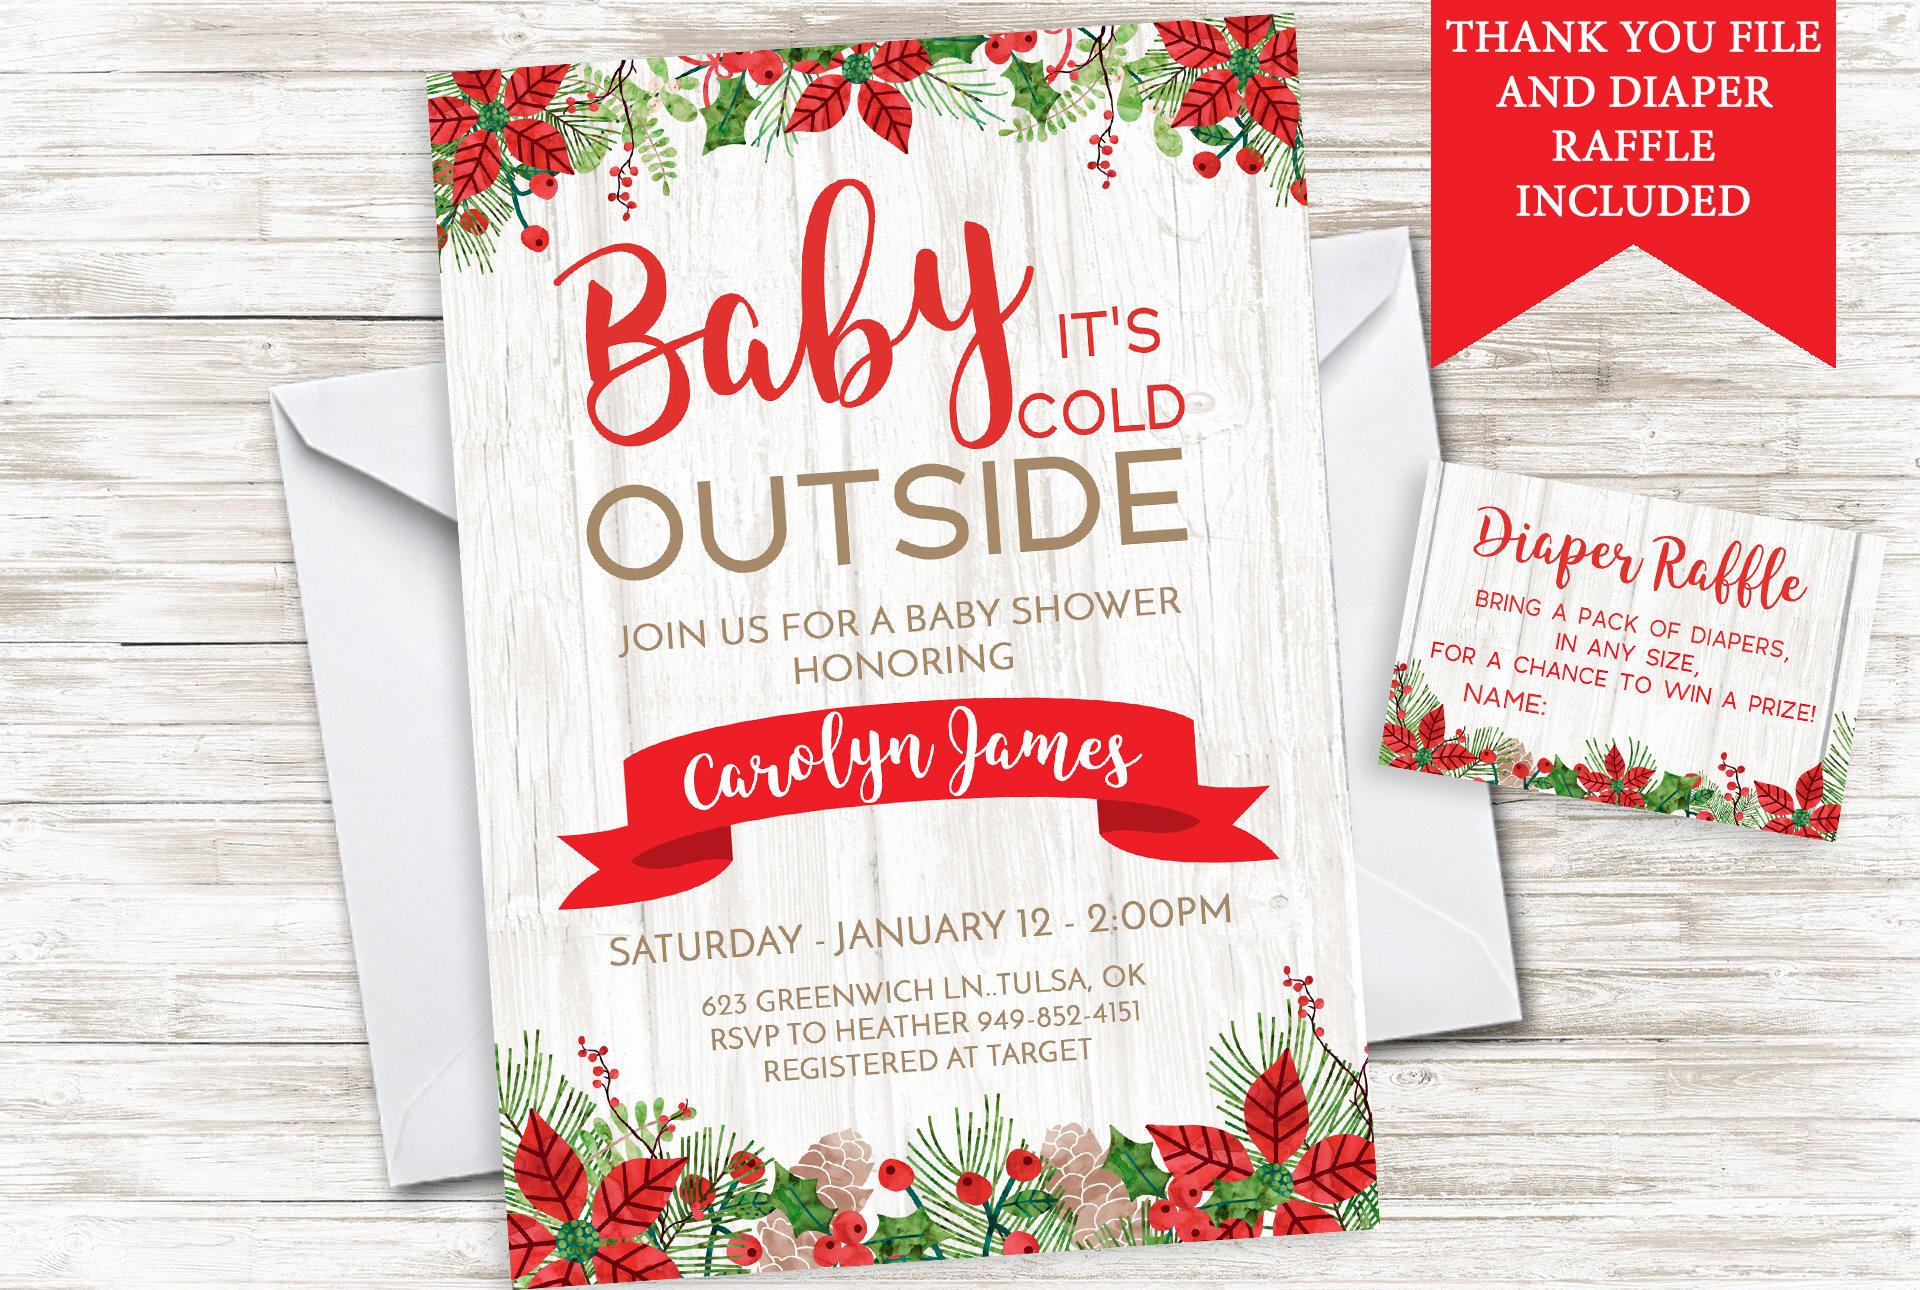 Funky Spanish Baby Shower Invitation Motif - Invitations and ...